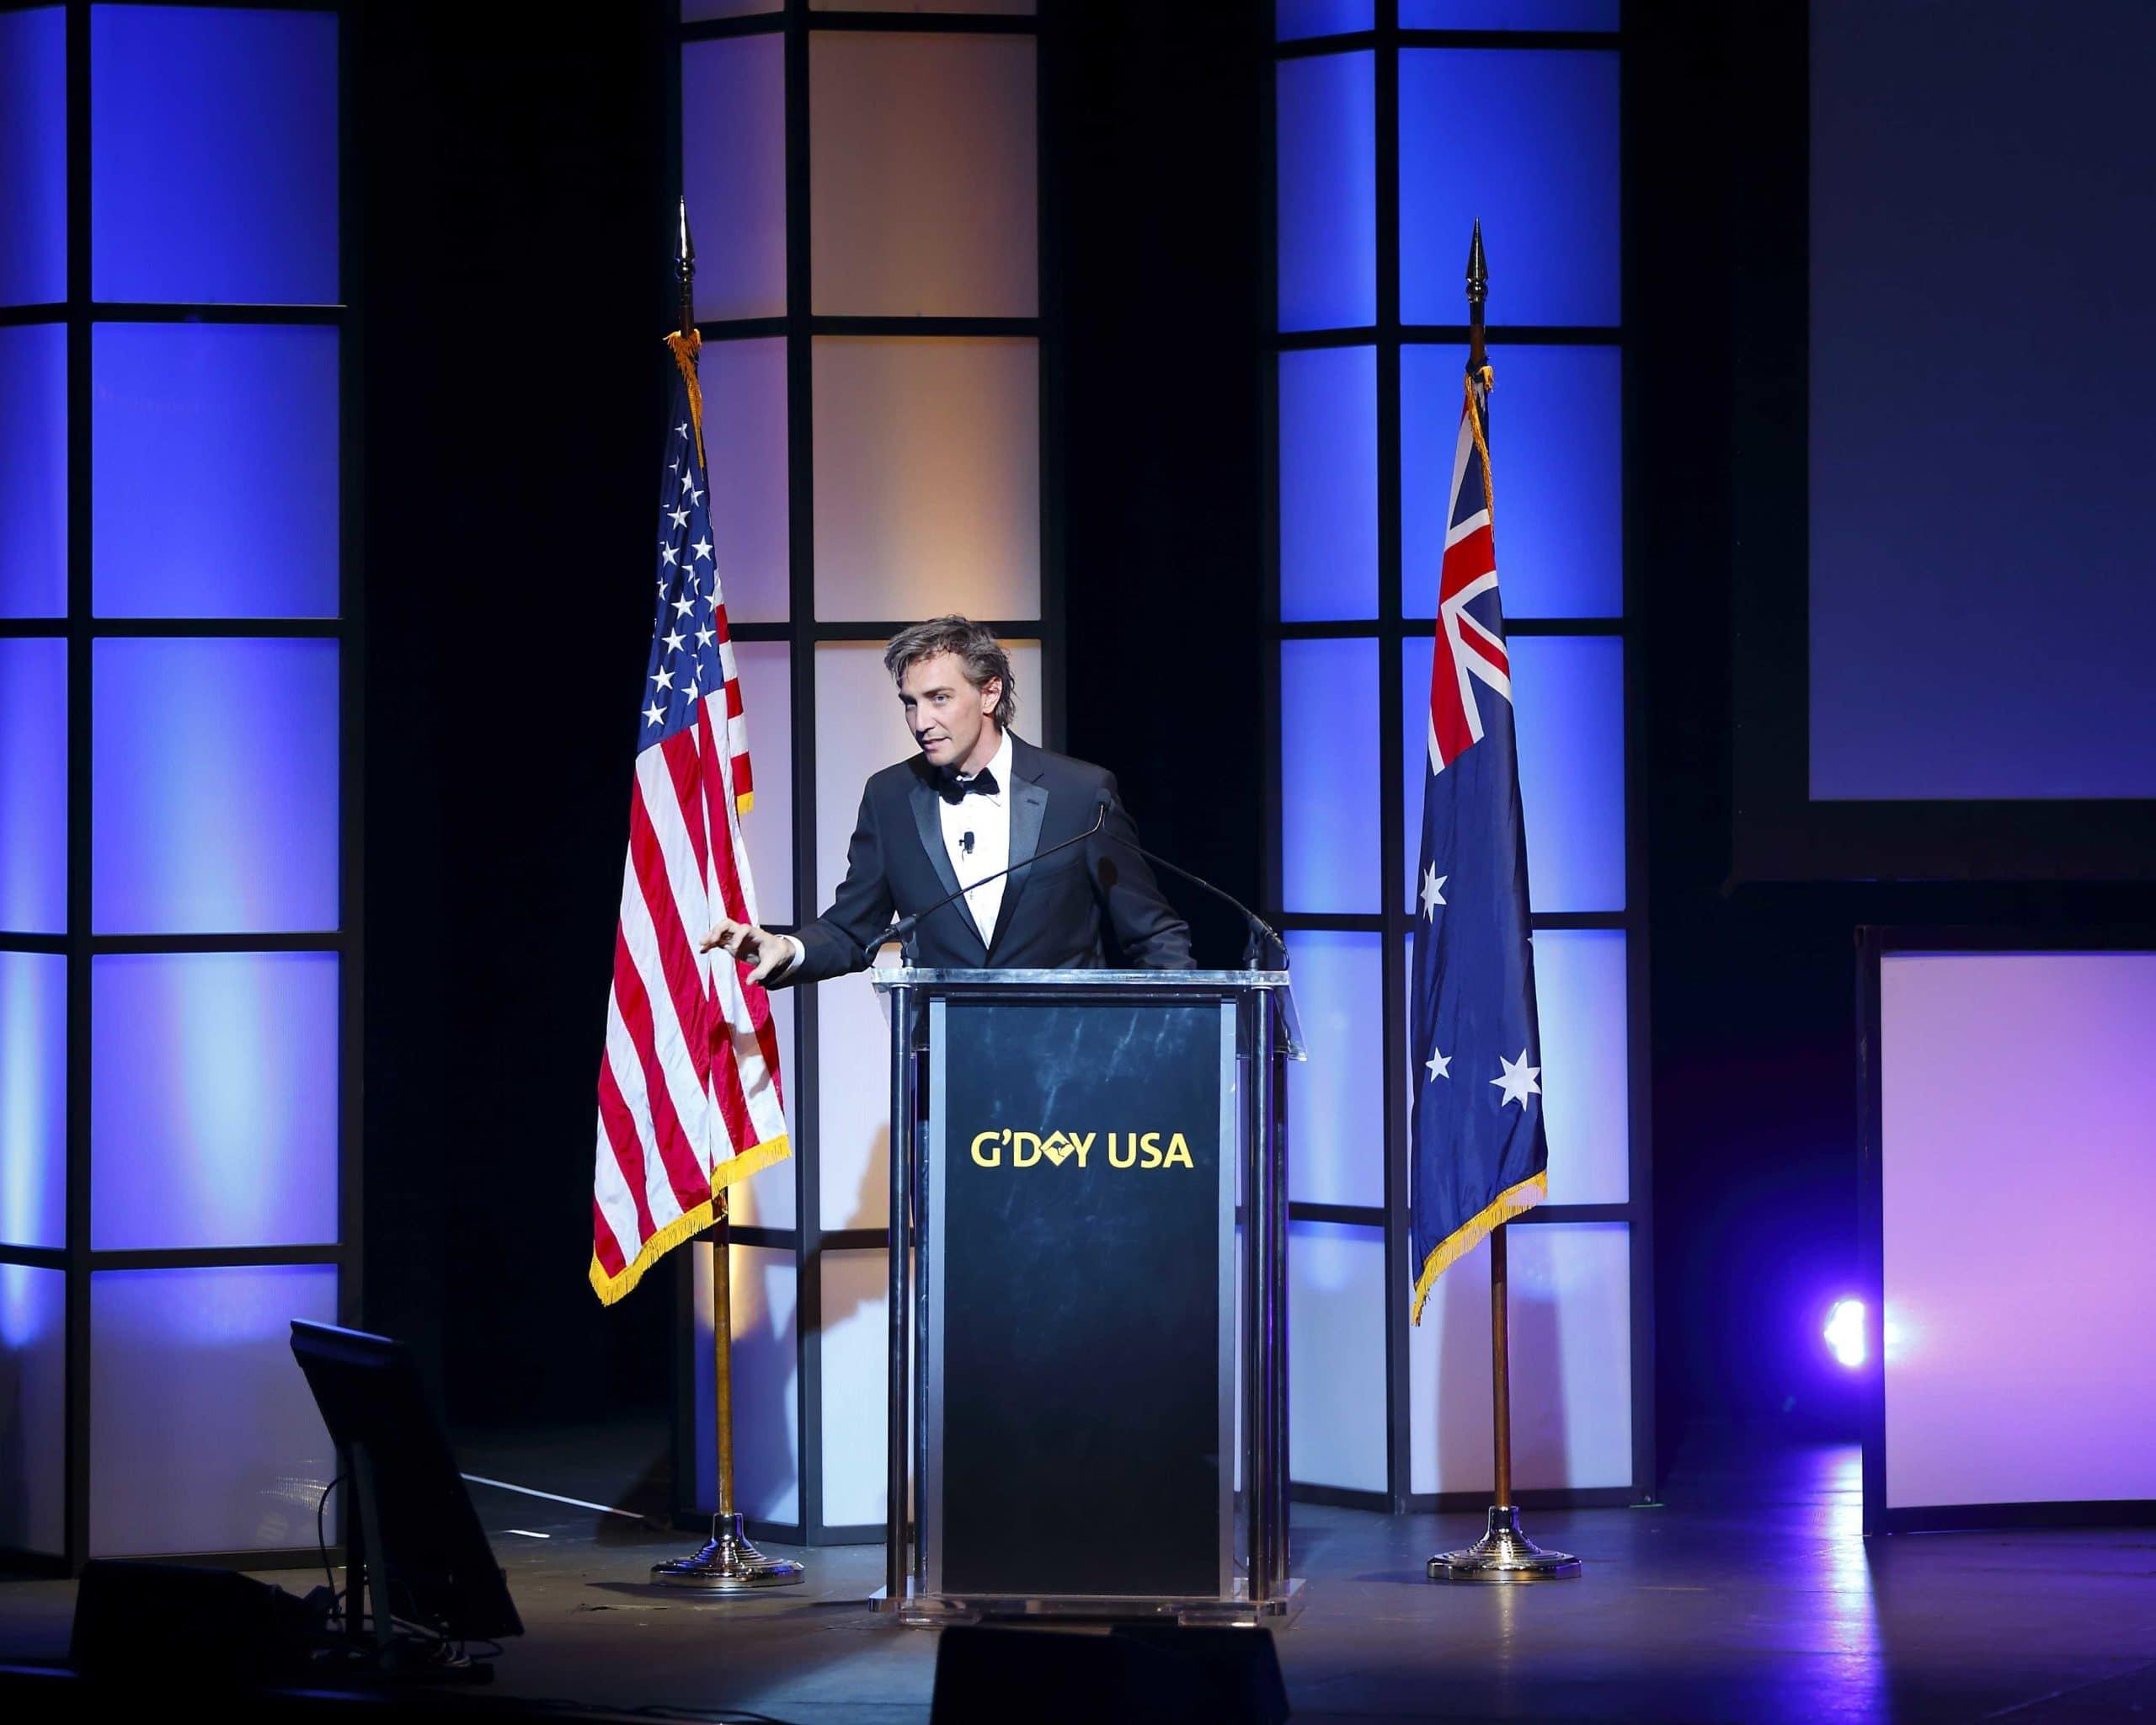 Innovators Xchange 2016 G'Day USA standing at podium hosting the event